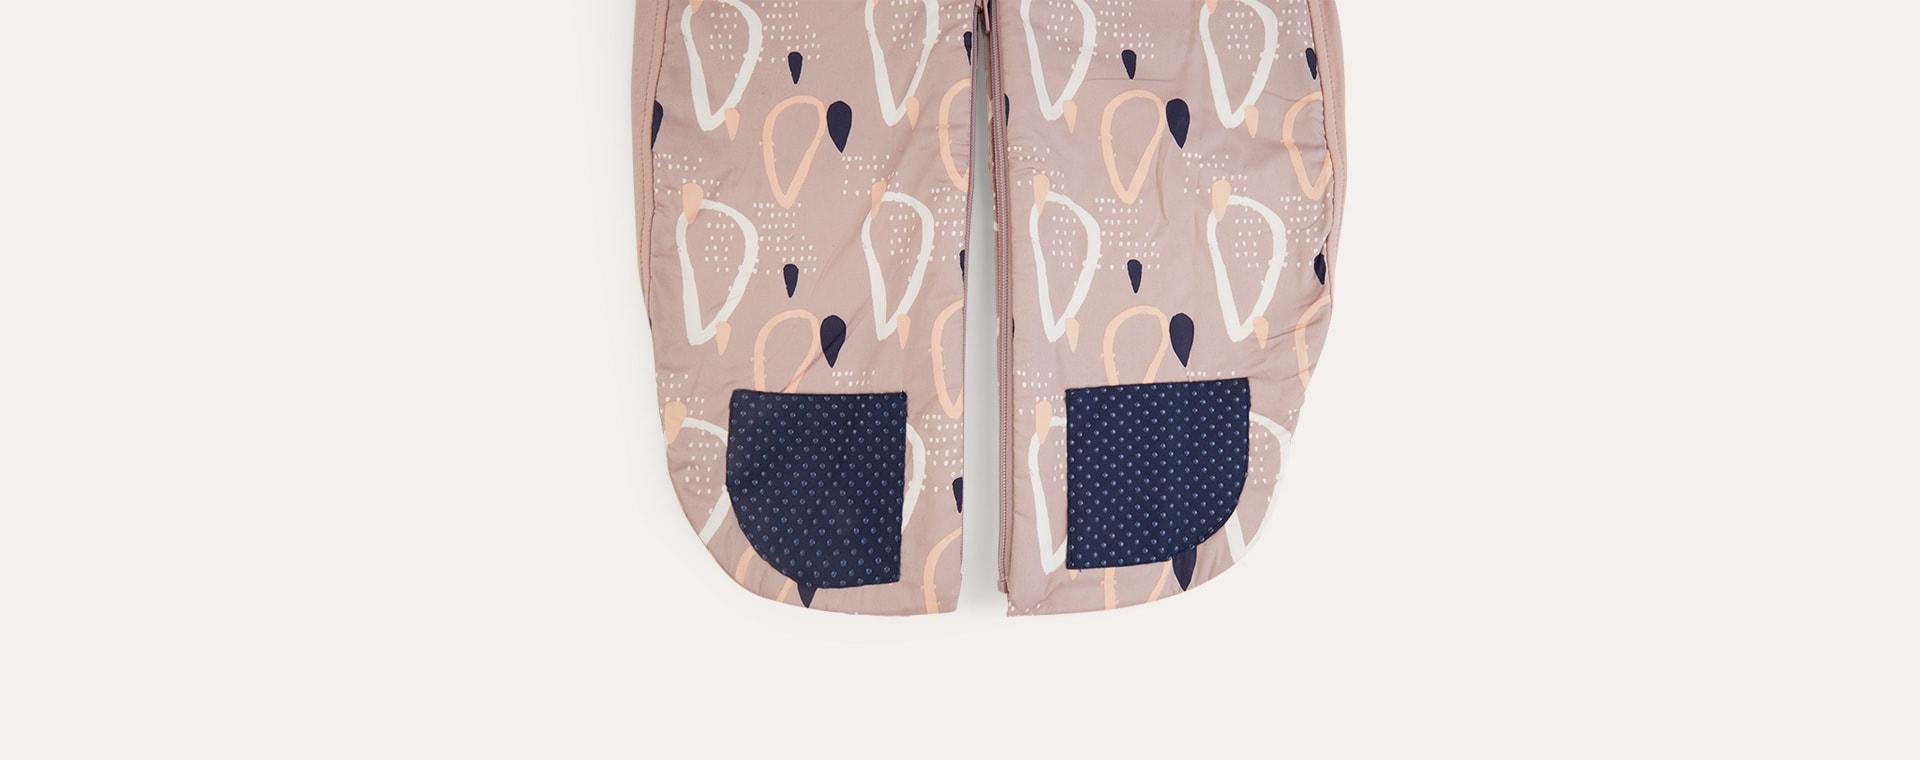 Drops Ergopouch Sleepsuit Bag - 1 Tog